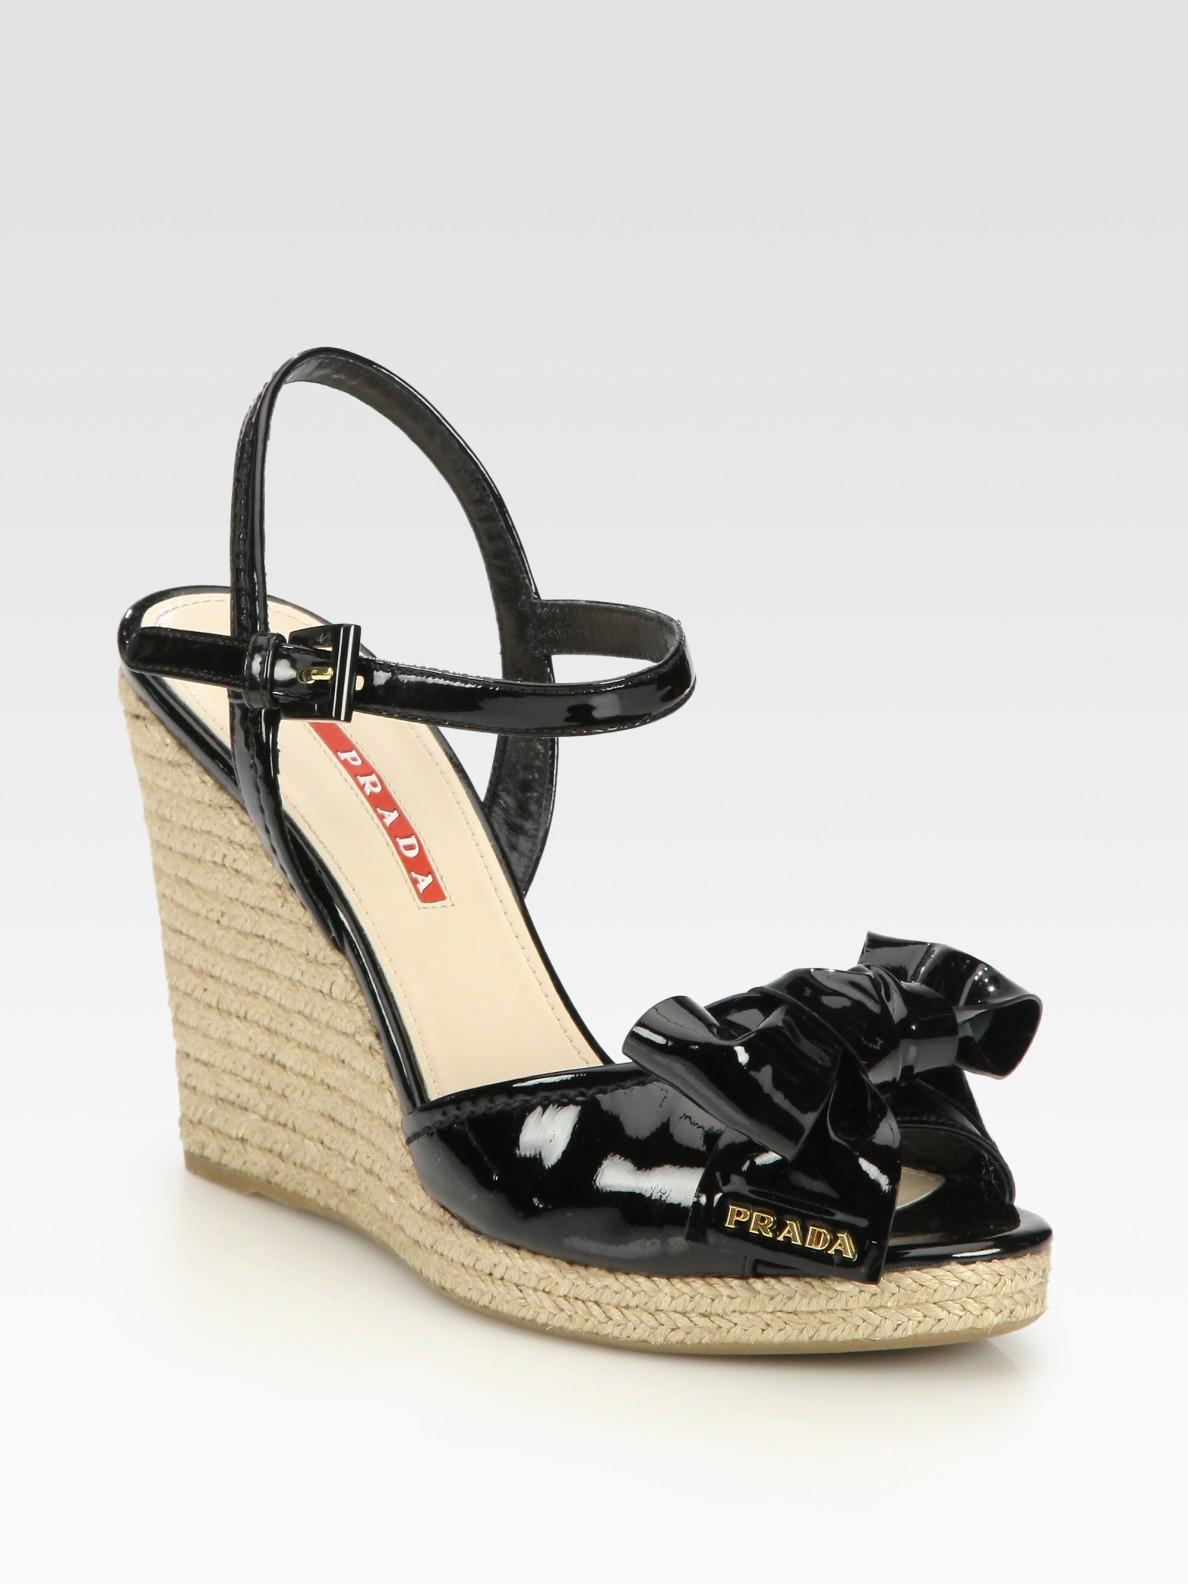 787a5070c6b3 Lyst - Prada Patent Leather Espadrille Wedge Sandals in Black